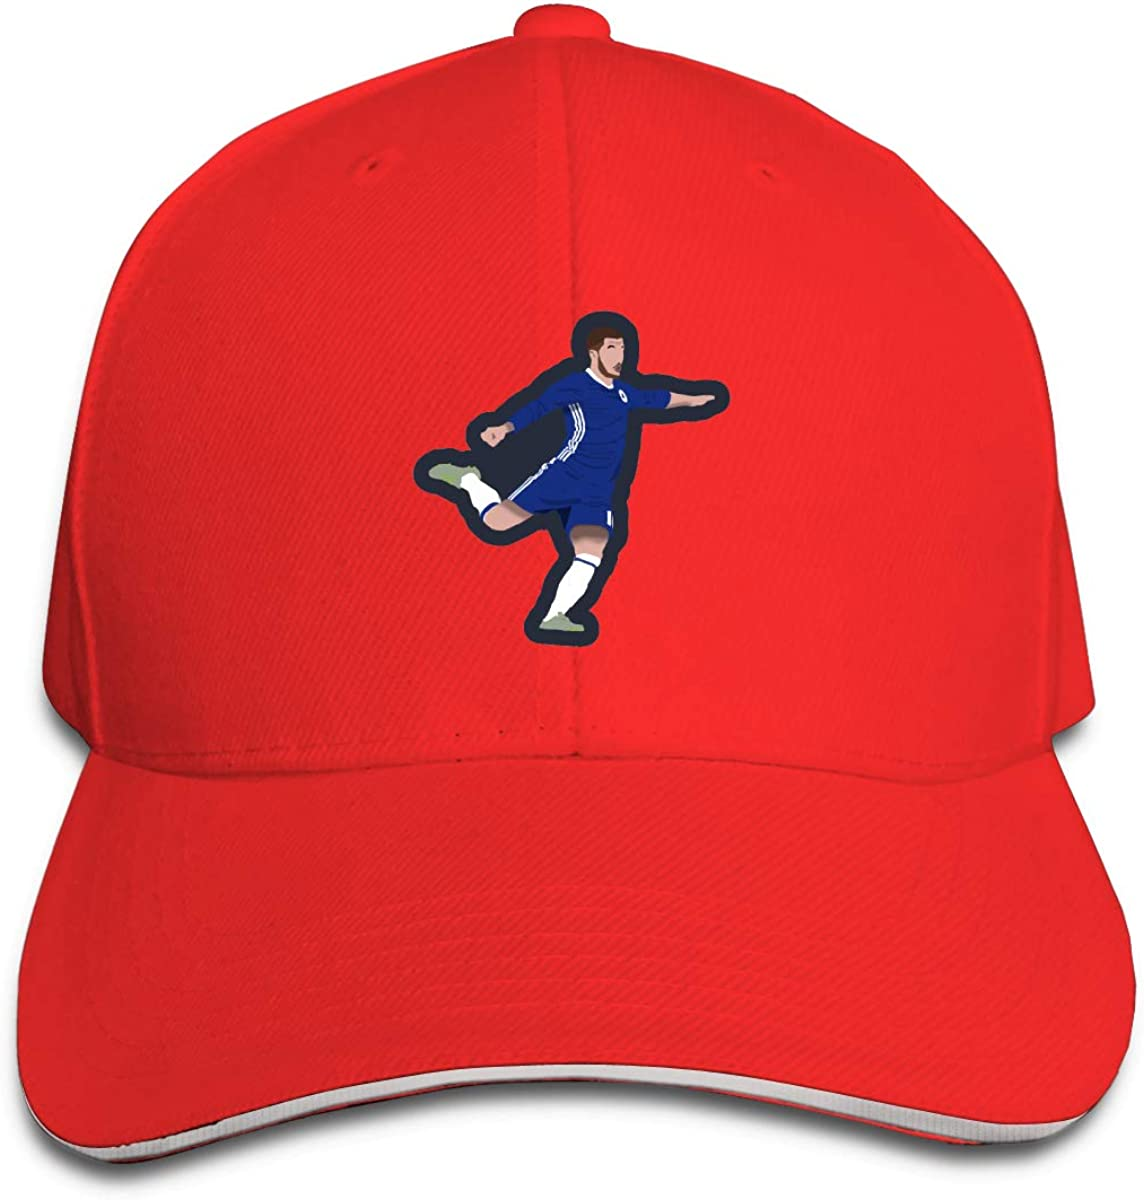 Haggai Romeo Unisex Football Eden-Hazard Snapback Baseball Cap Flat Brim Hip Hop Hat Adjustable Dad Hat